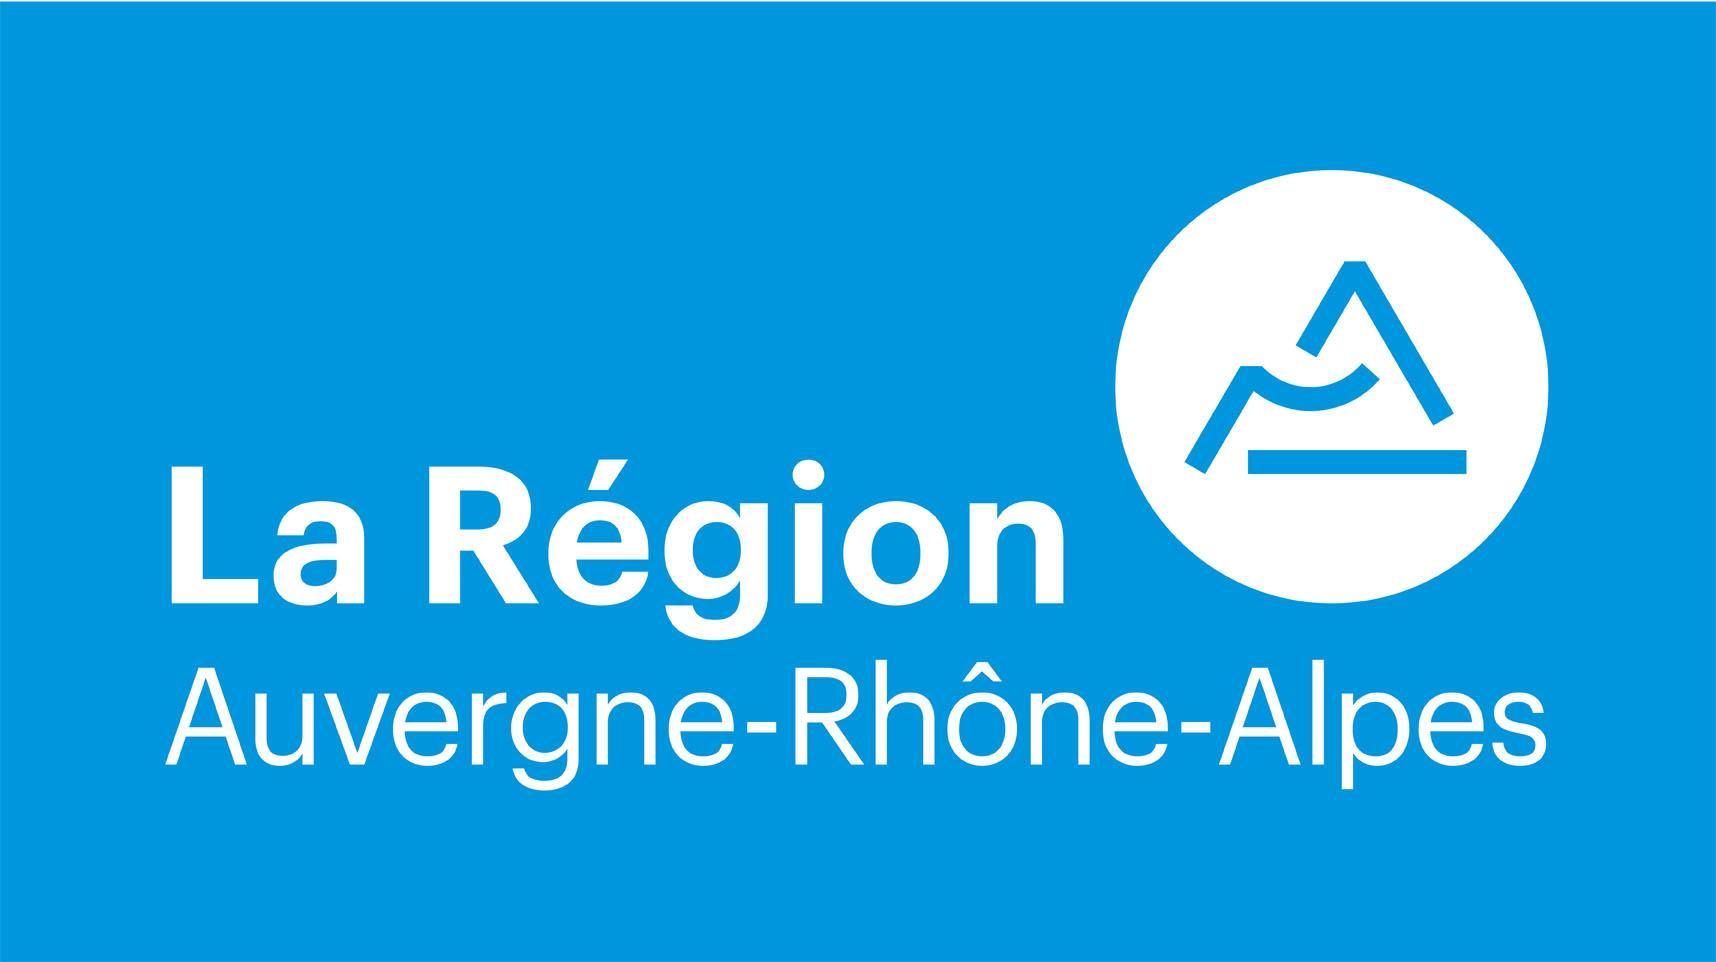 la-region-auvergne-rhone-alpes